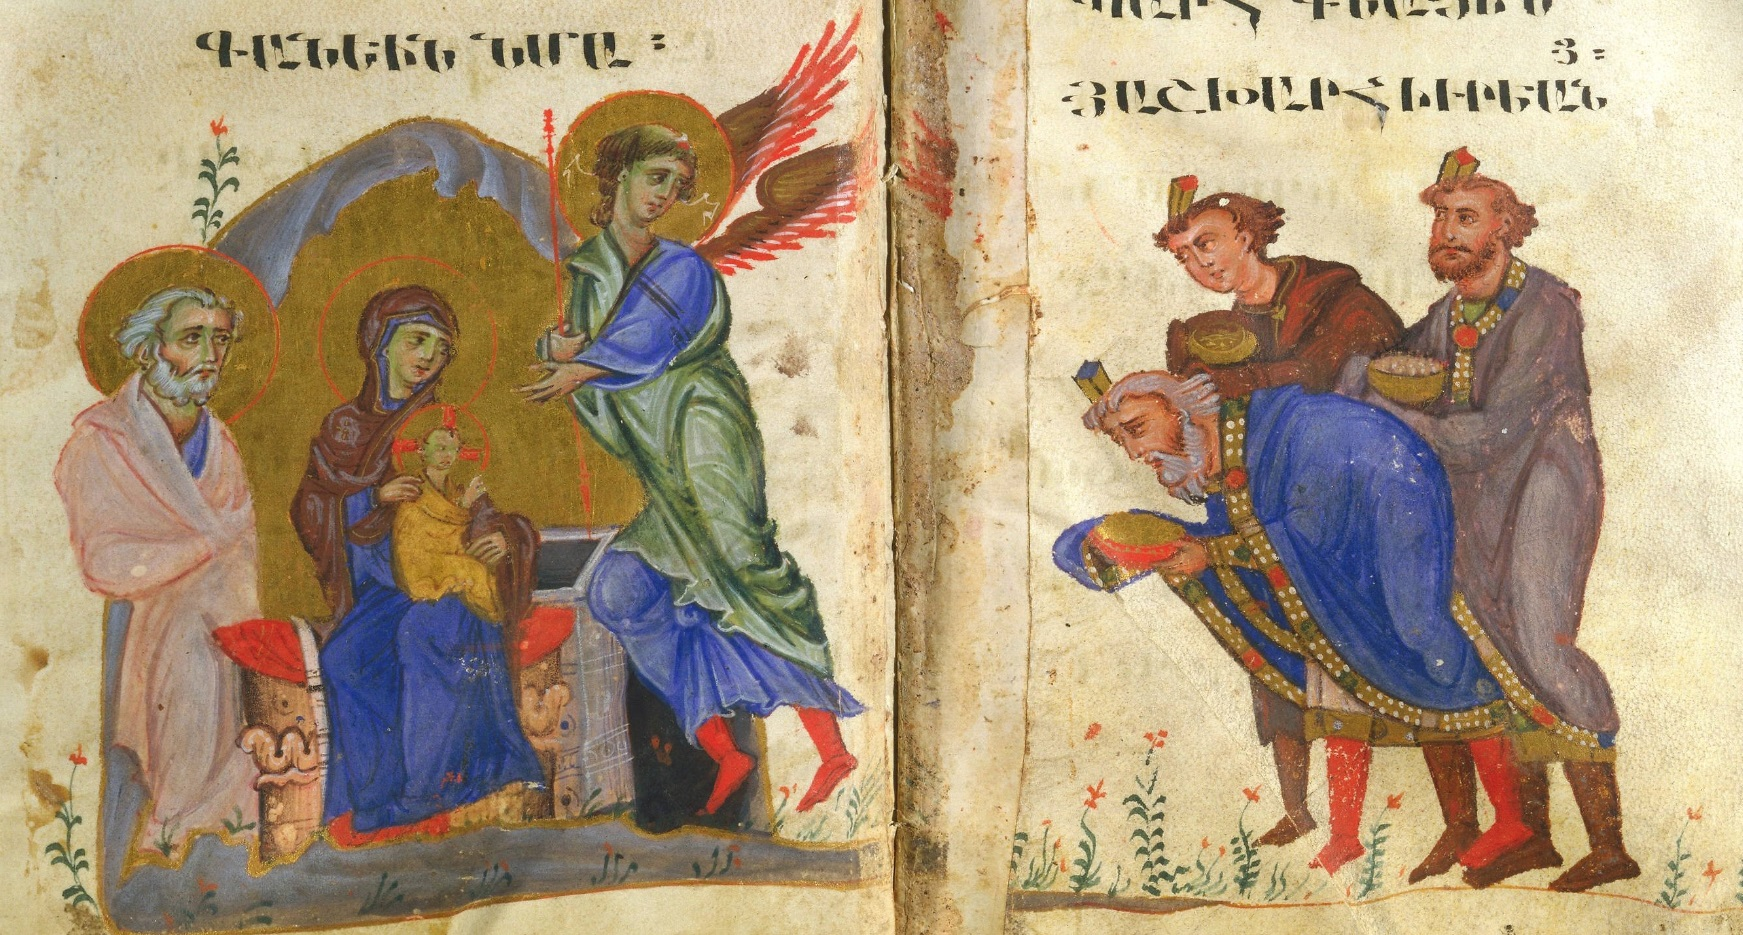 1200s-armenian-gospel-13c.jpg